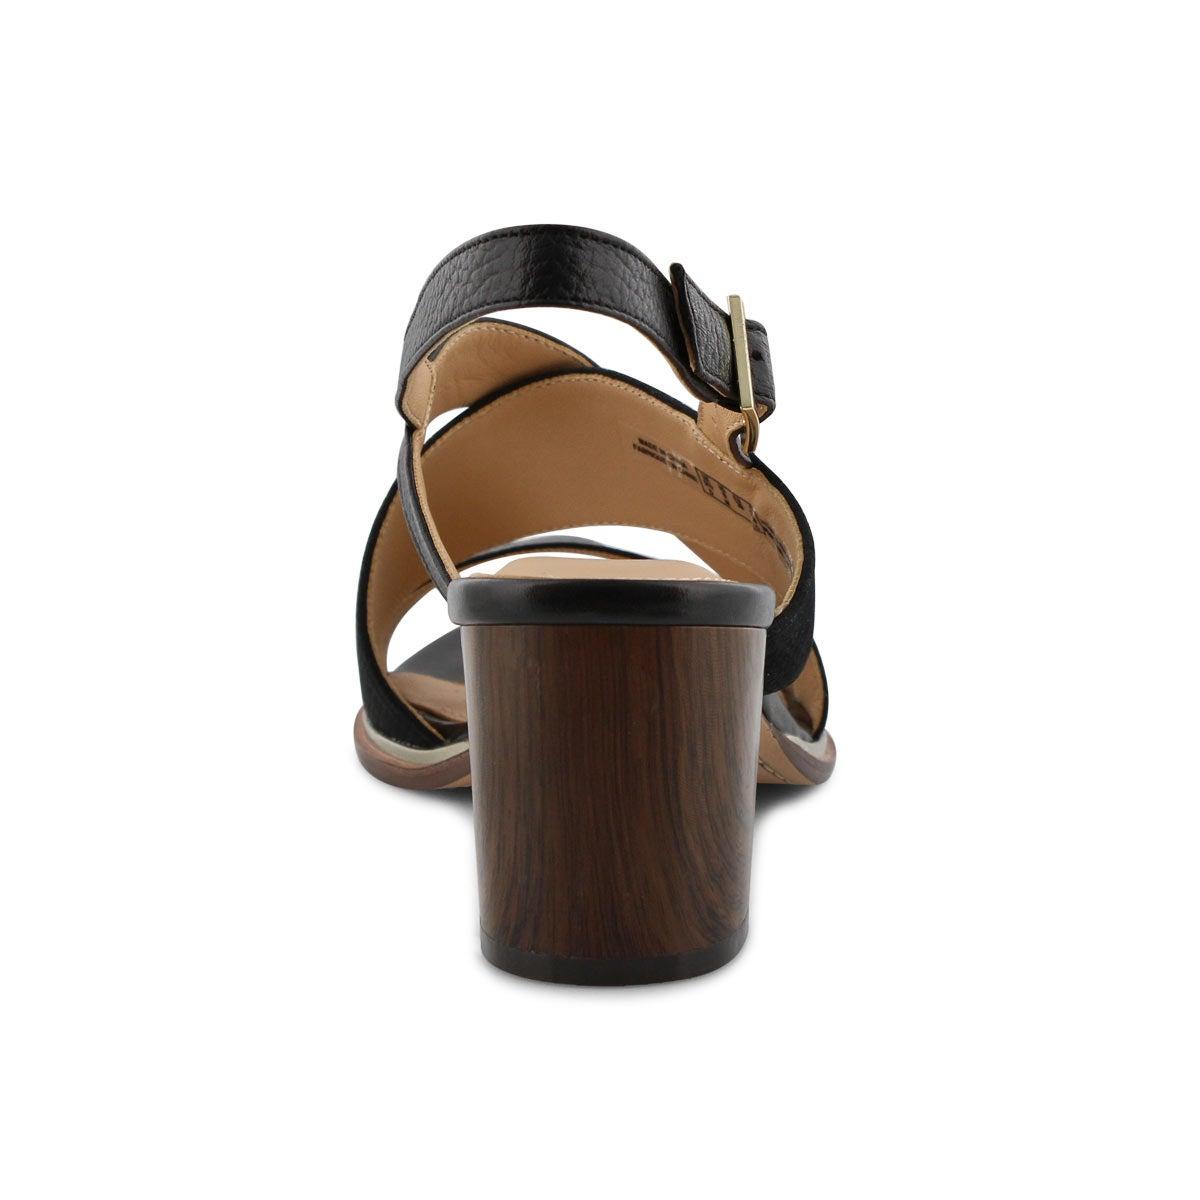 Lds Ellis Tilda black dress sandal